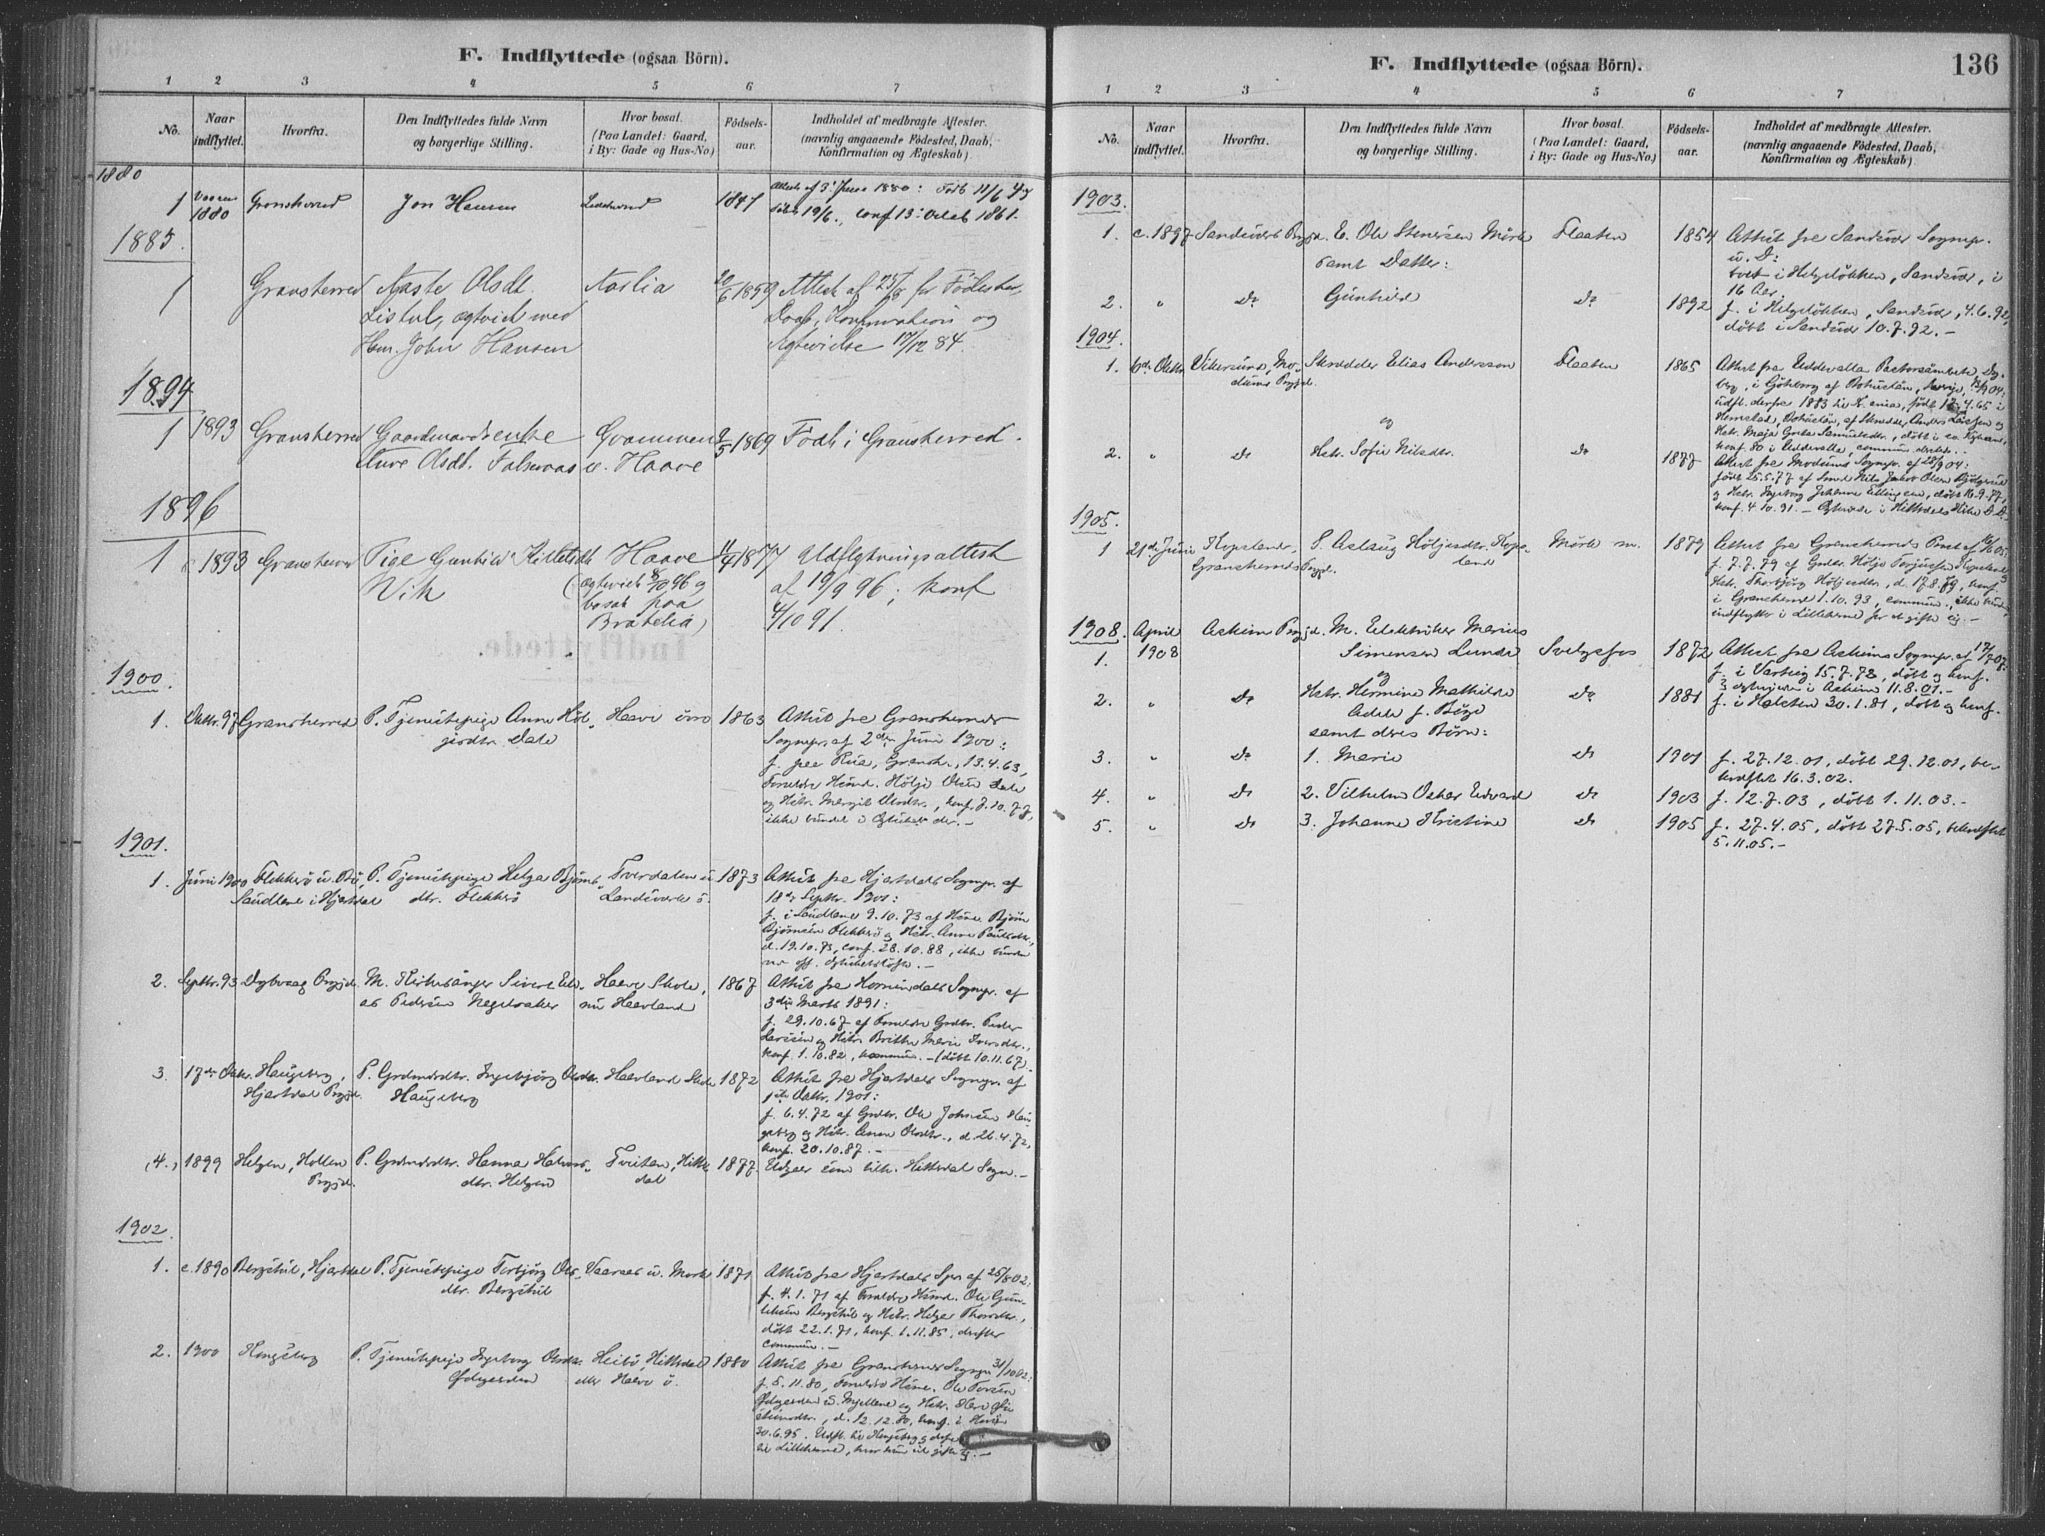 SAKO, Heddal kirkebøker, F/Fb/L0002: Ministerialbok nr. II 2, 1878-1913, s. 136